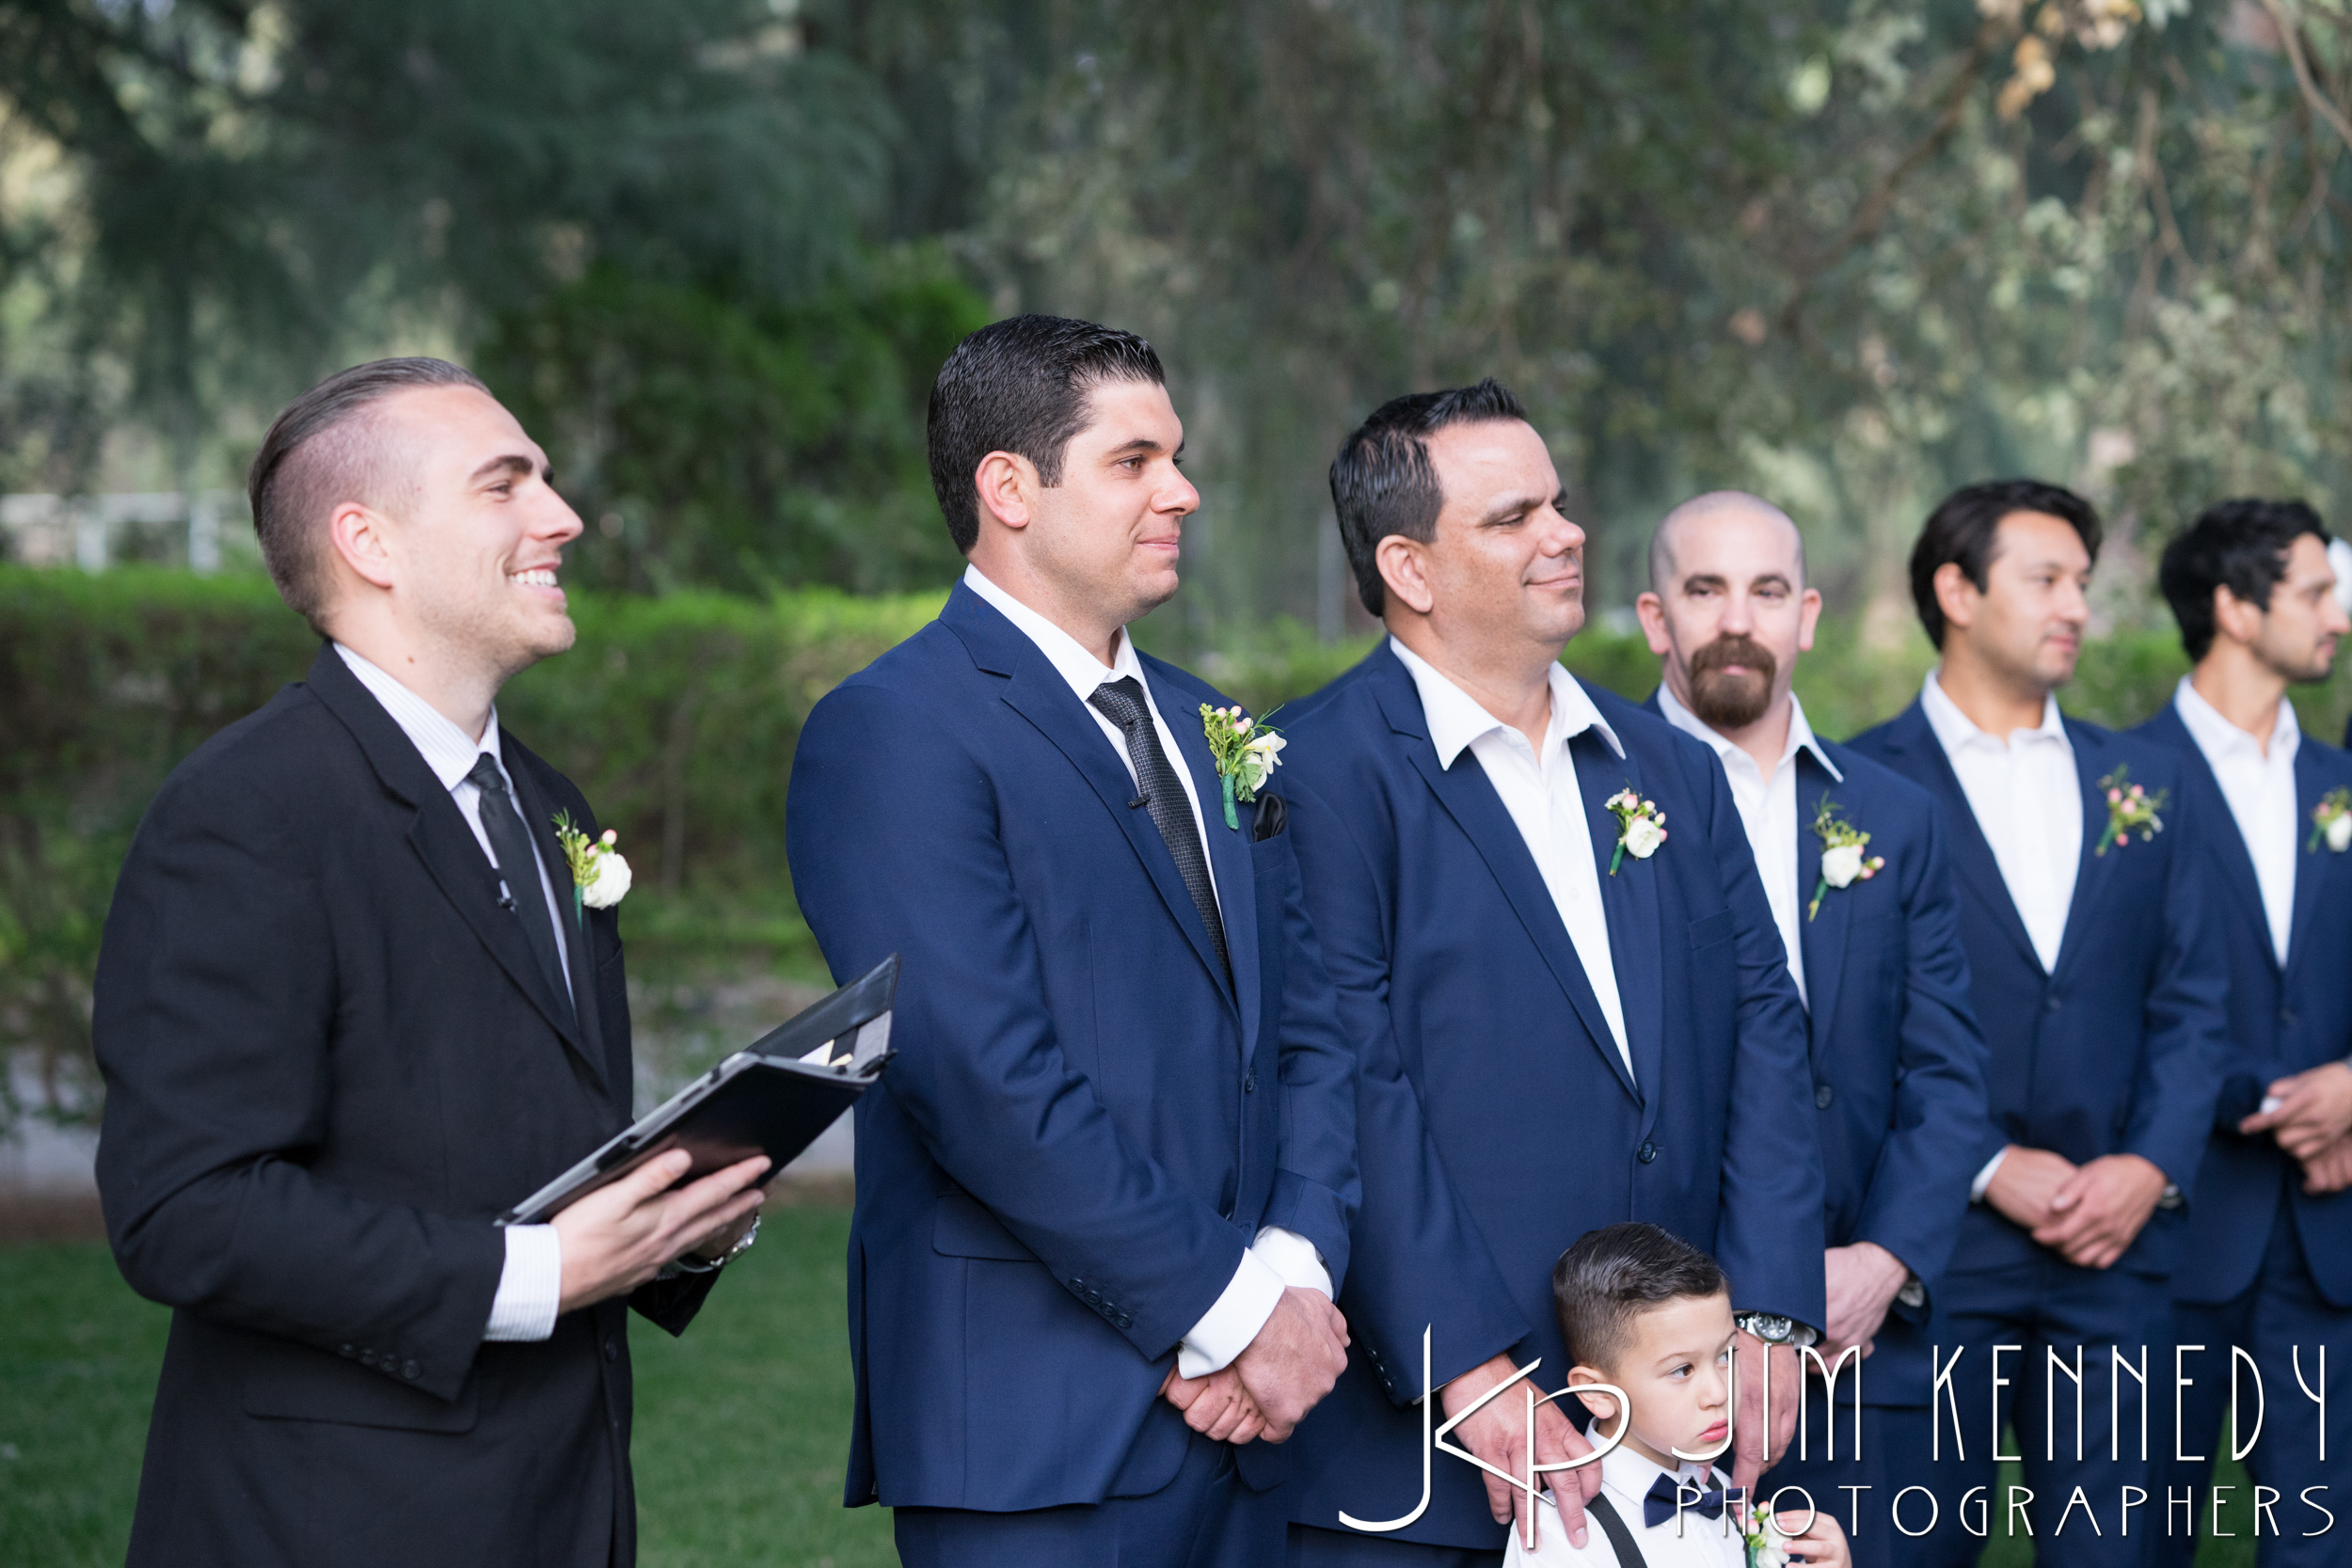 jim_kennedy_photographers_highland_springs_wedding_caitlyn_0102.jpg